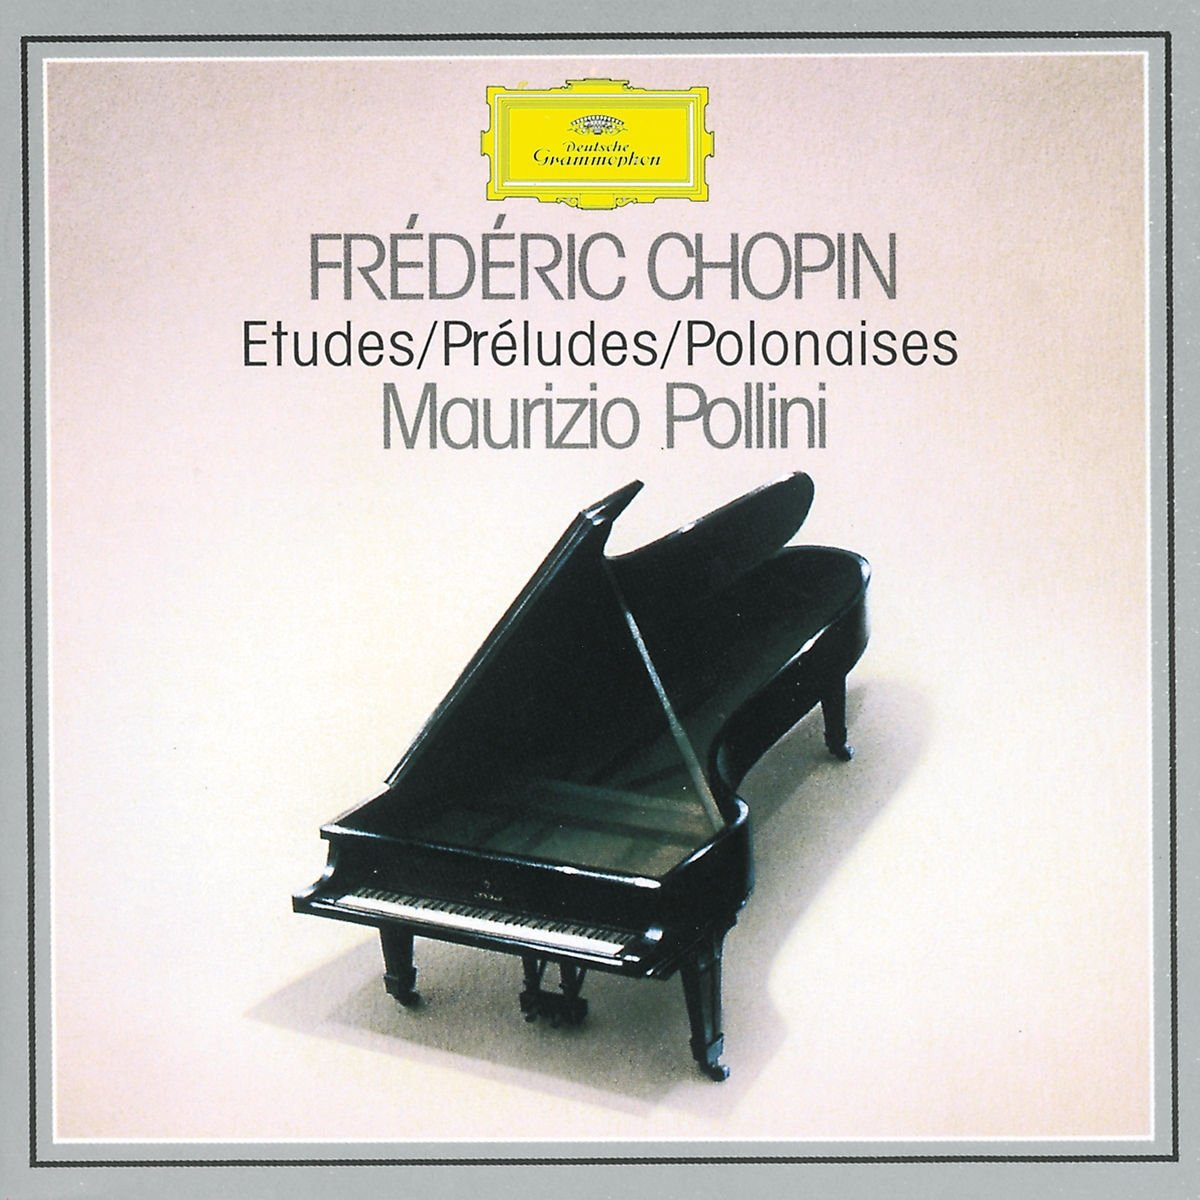 Chopin: Etudes/Preludes/Polonaises